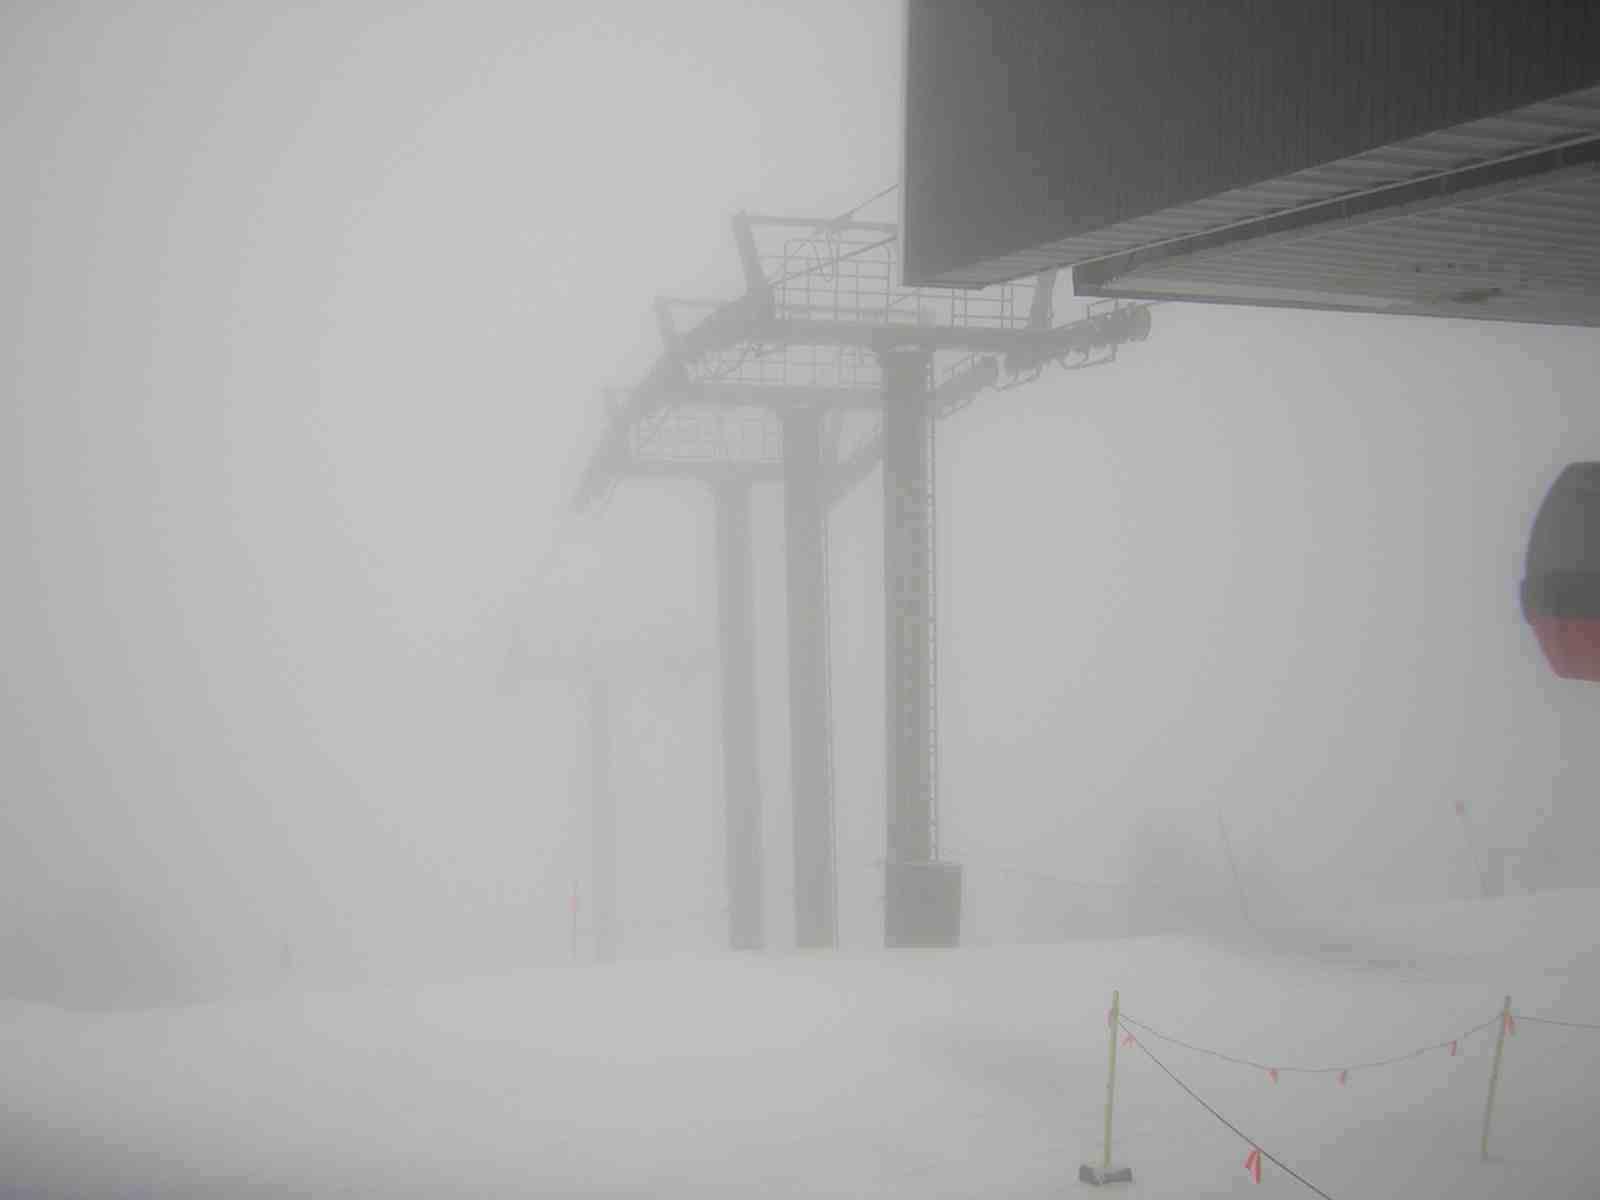 Stowe Gondola in Storm